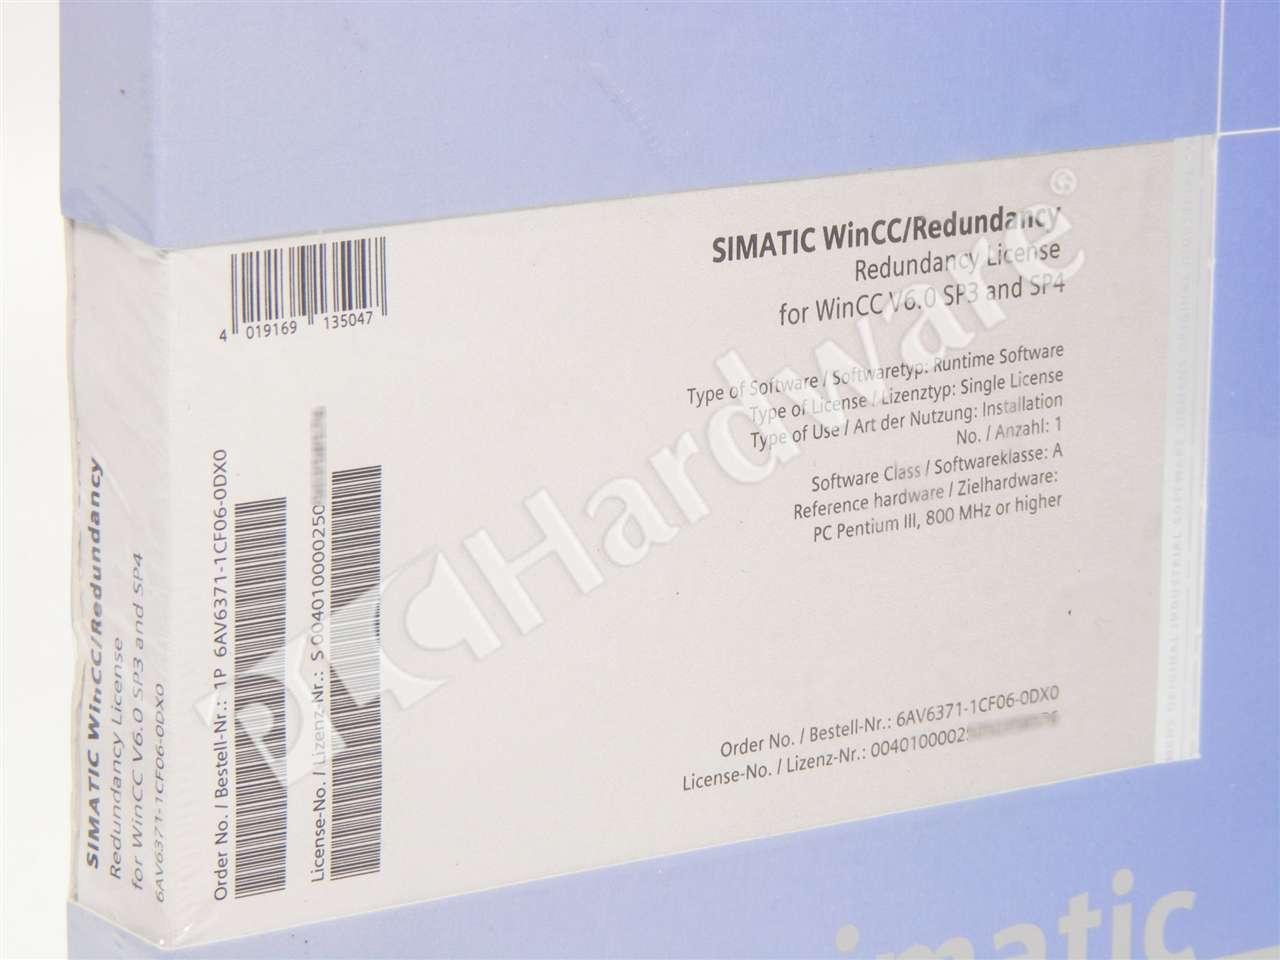 Details about New Sealed Siemens 6AV6371-1CF06-0DX0 6AV6 371-1CF06-0DX0  SIMATIC WinCC Software